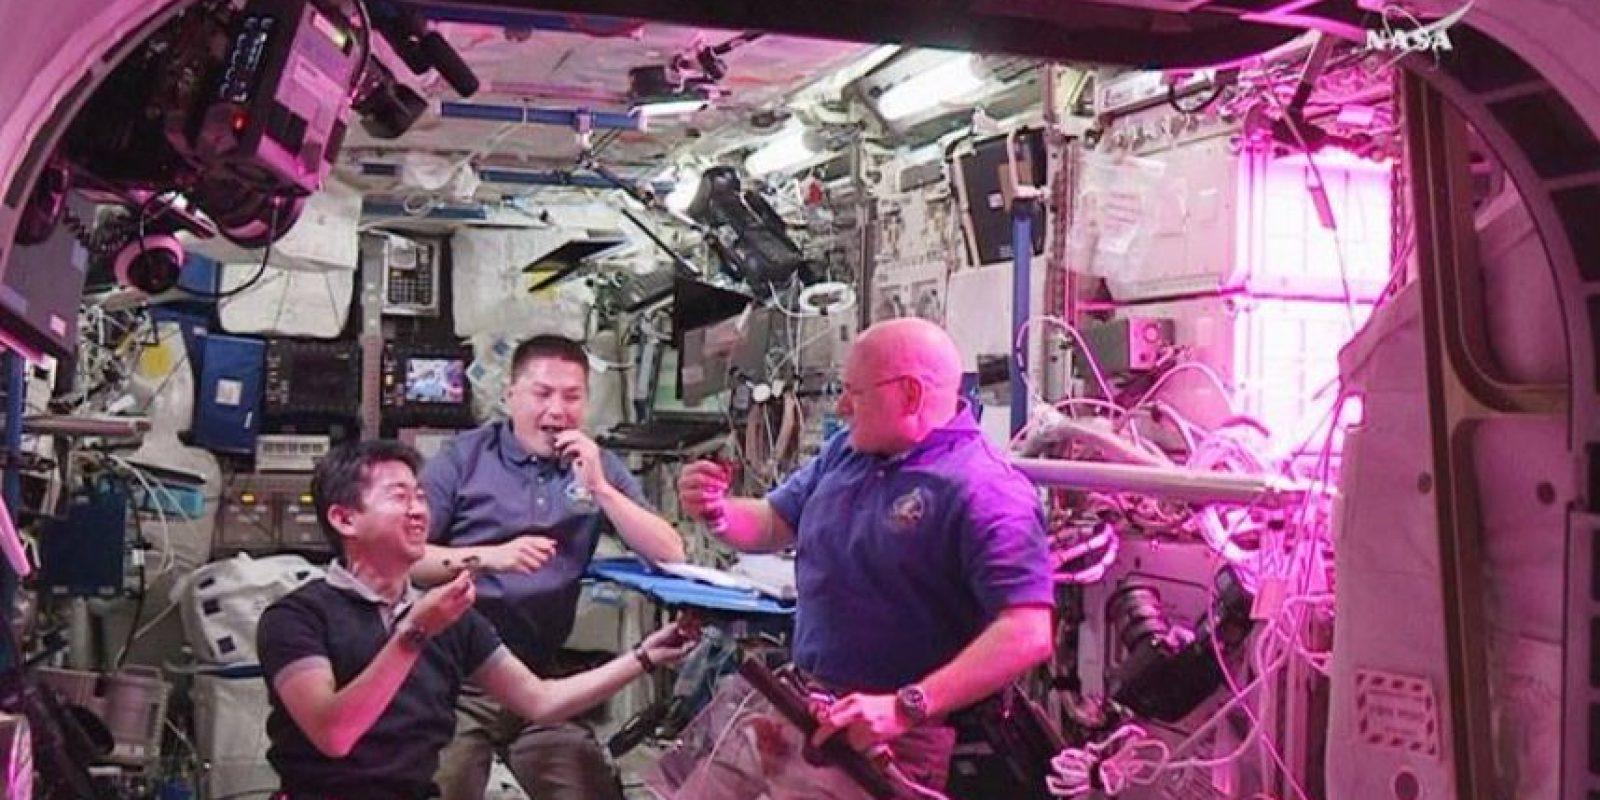 La agencia espacial respondió a través de Facebook Foto:Facebook.com/NASA